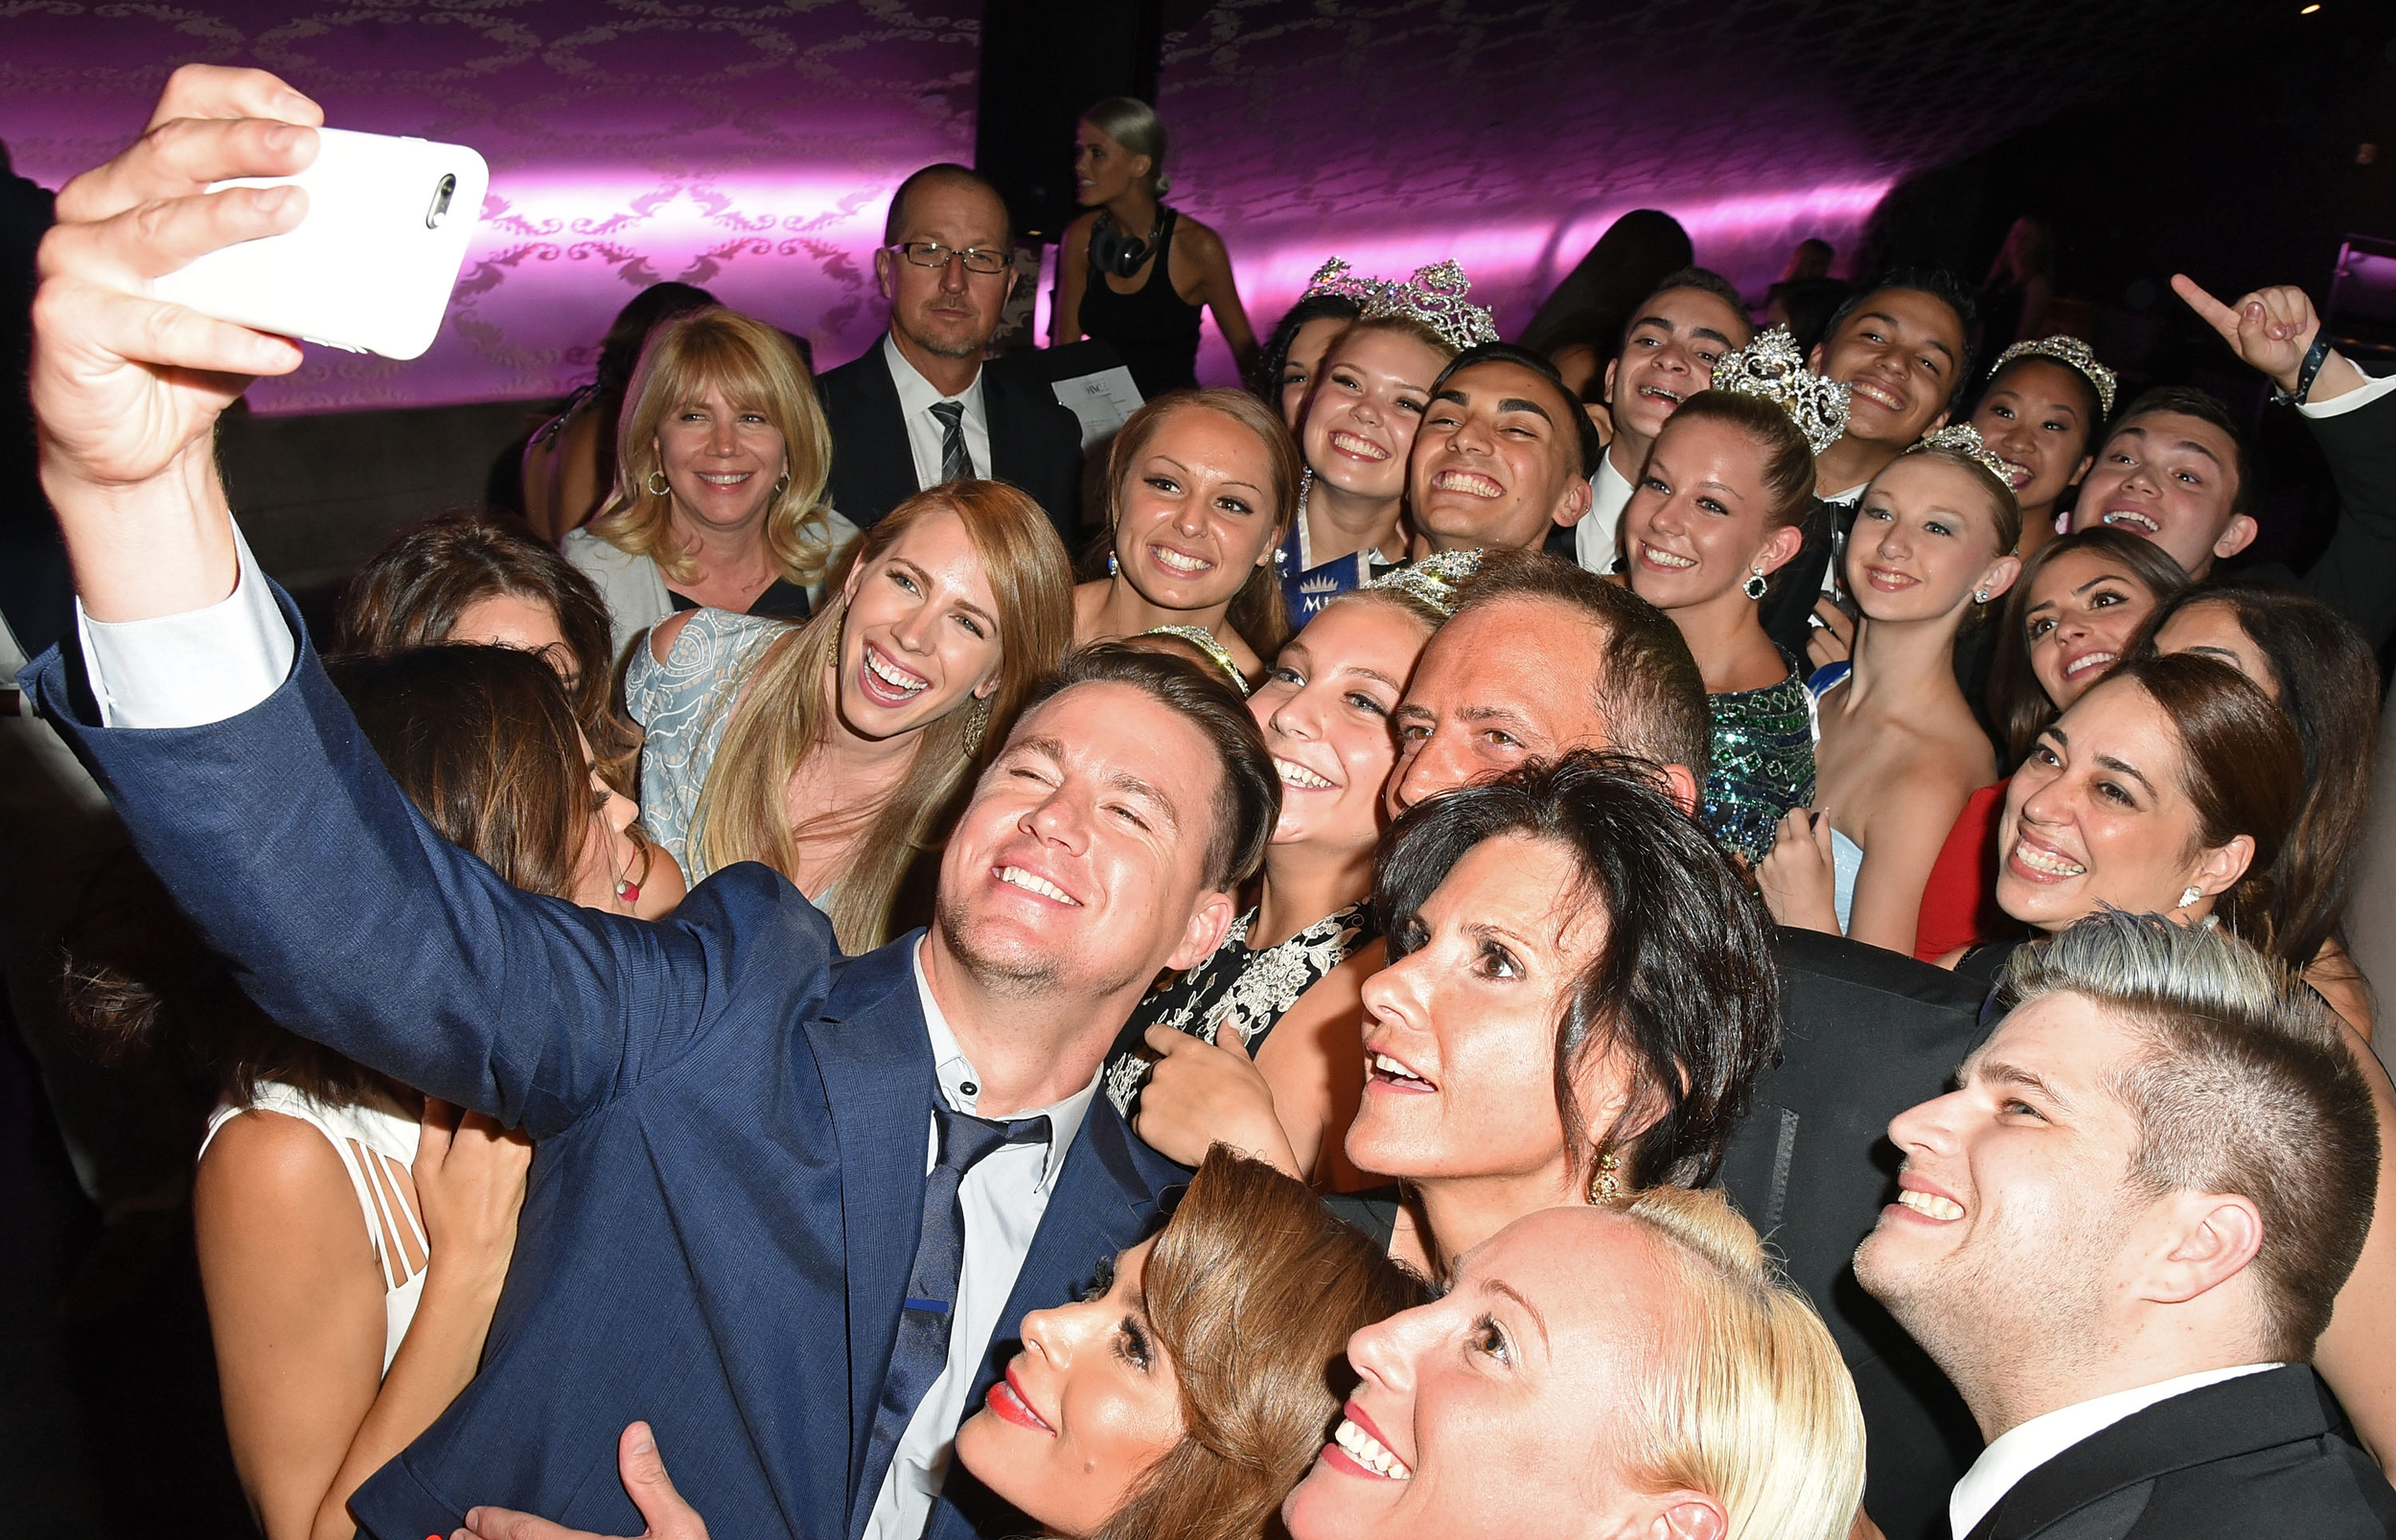 Channing Tatum, his wifeJenna Dewan-Tatum &Paula Abdul take 'selfies' with guests.